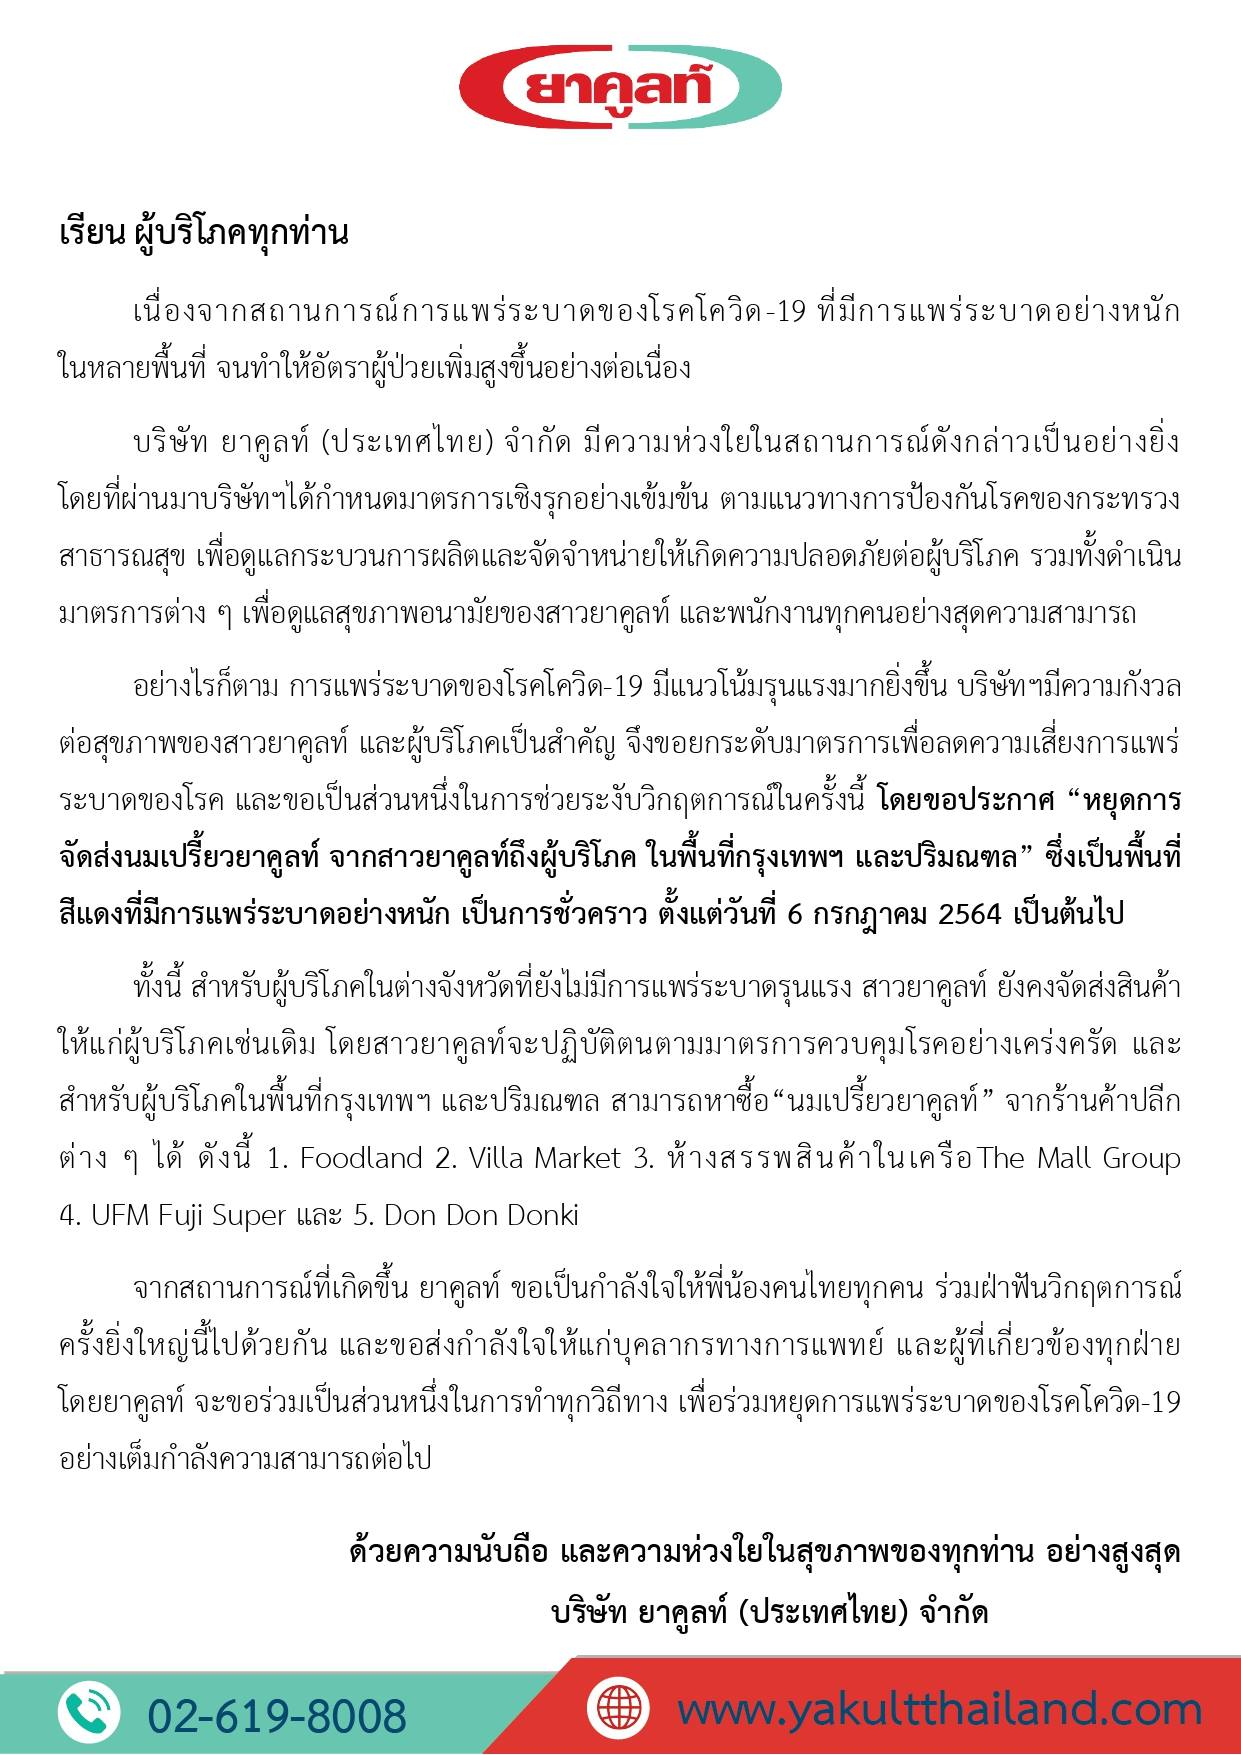 yakult thailand